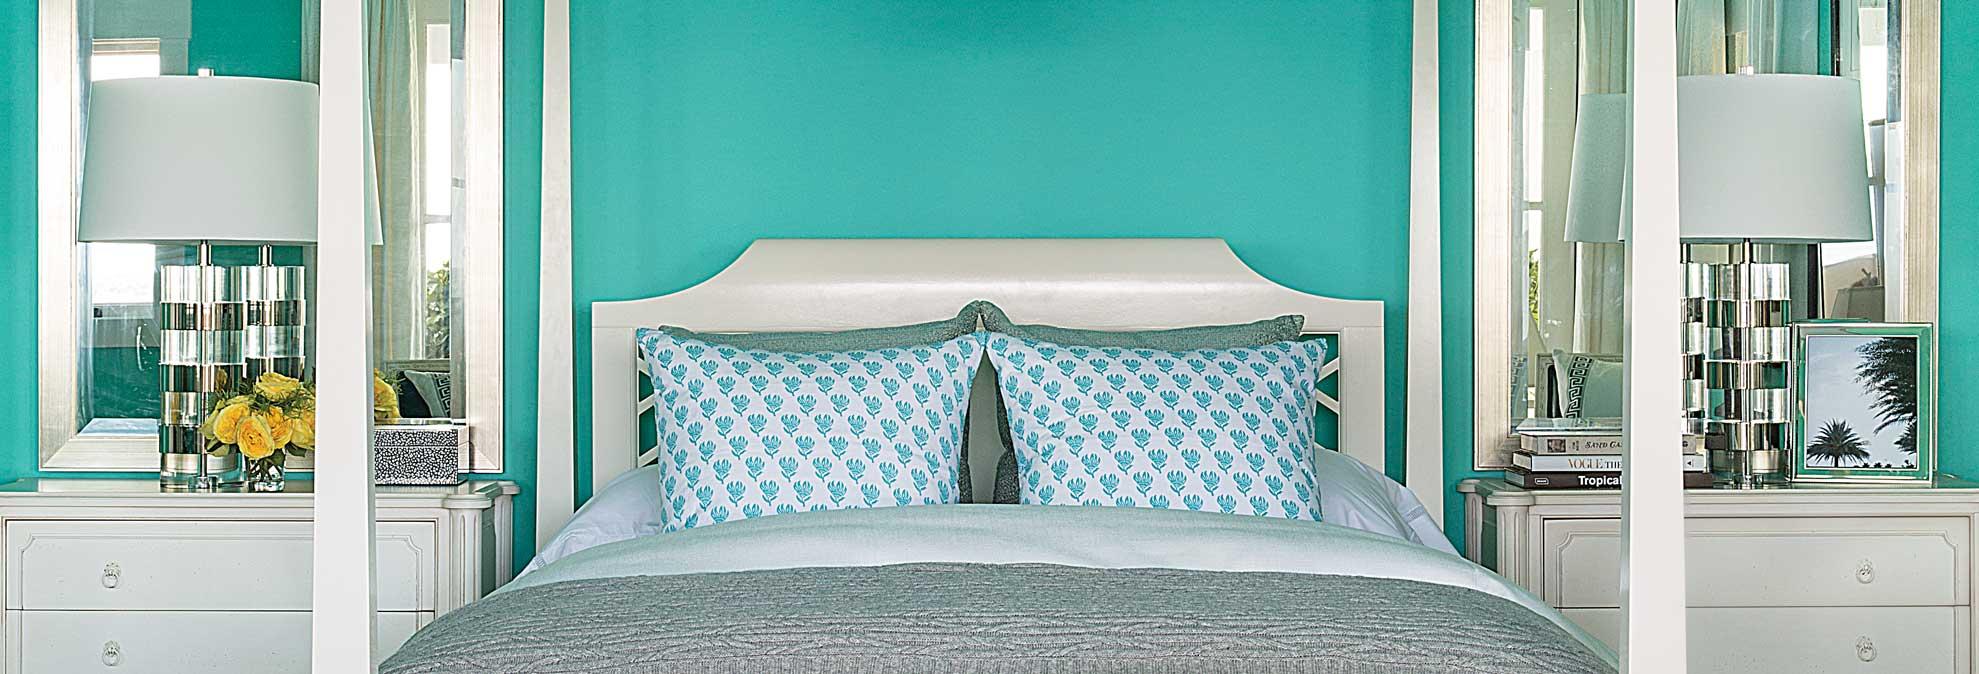 consumer reports best interior paint interior design. Black Bedroom Furniture Sets. Home Design Ideas